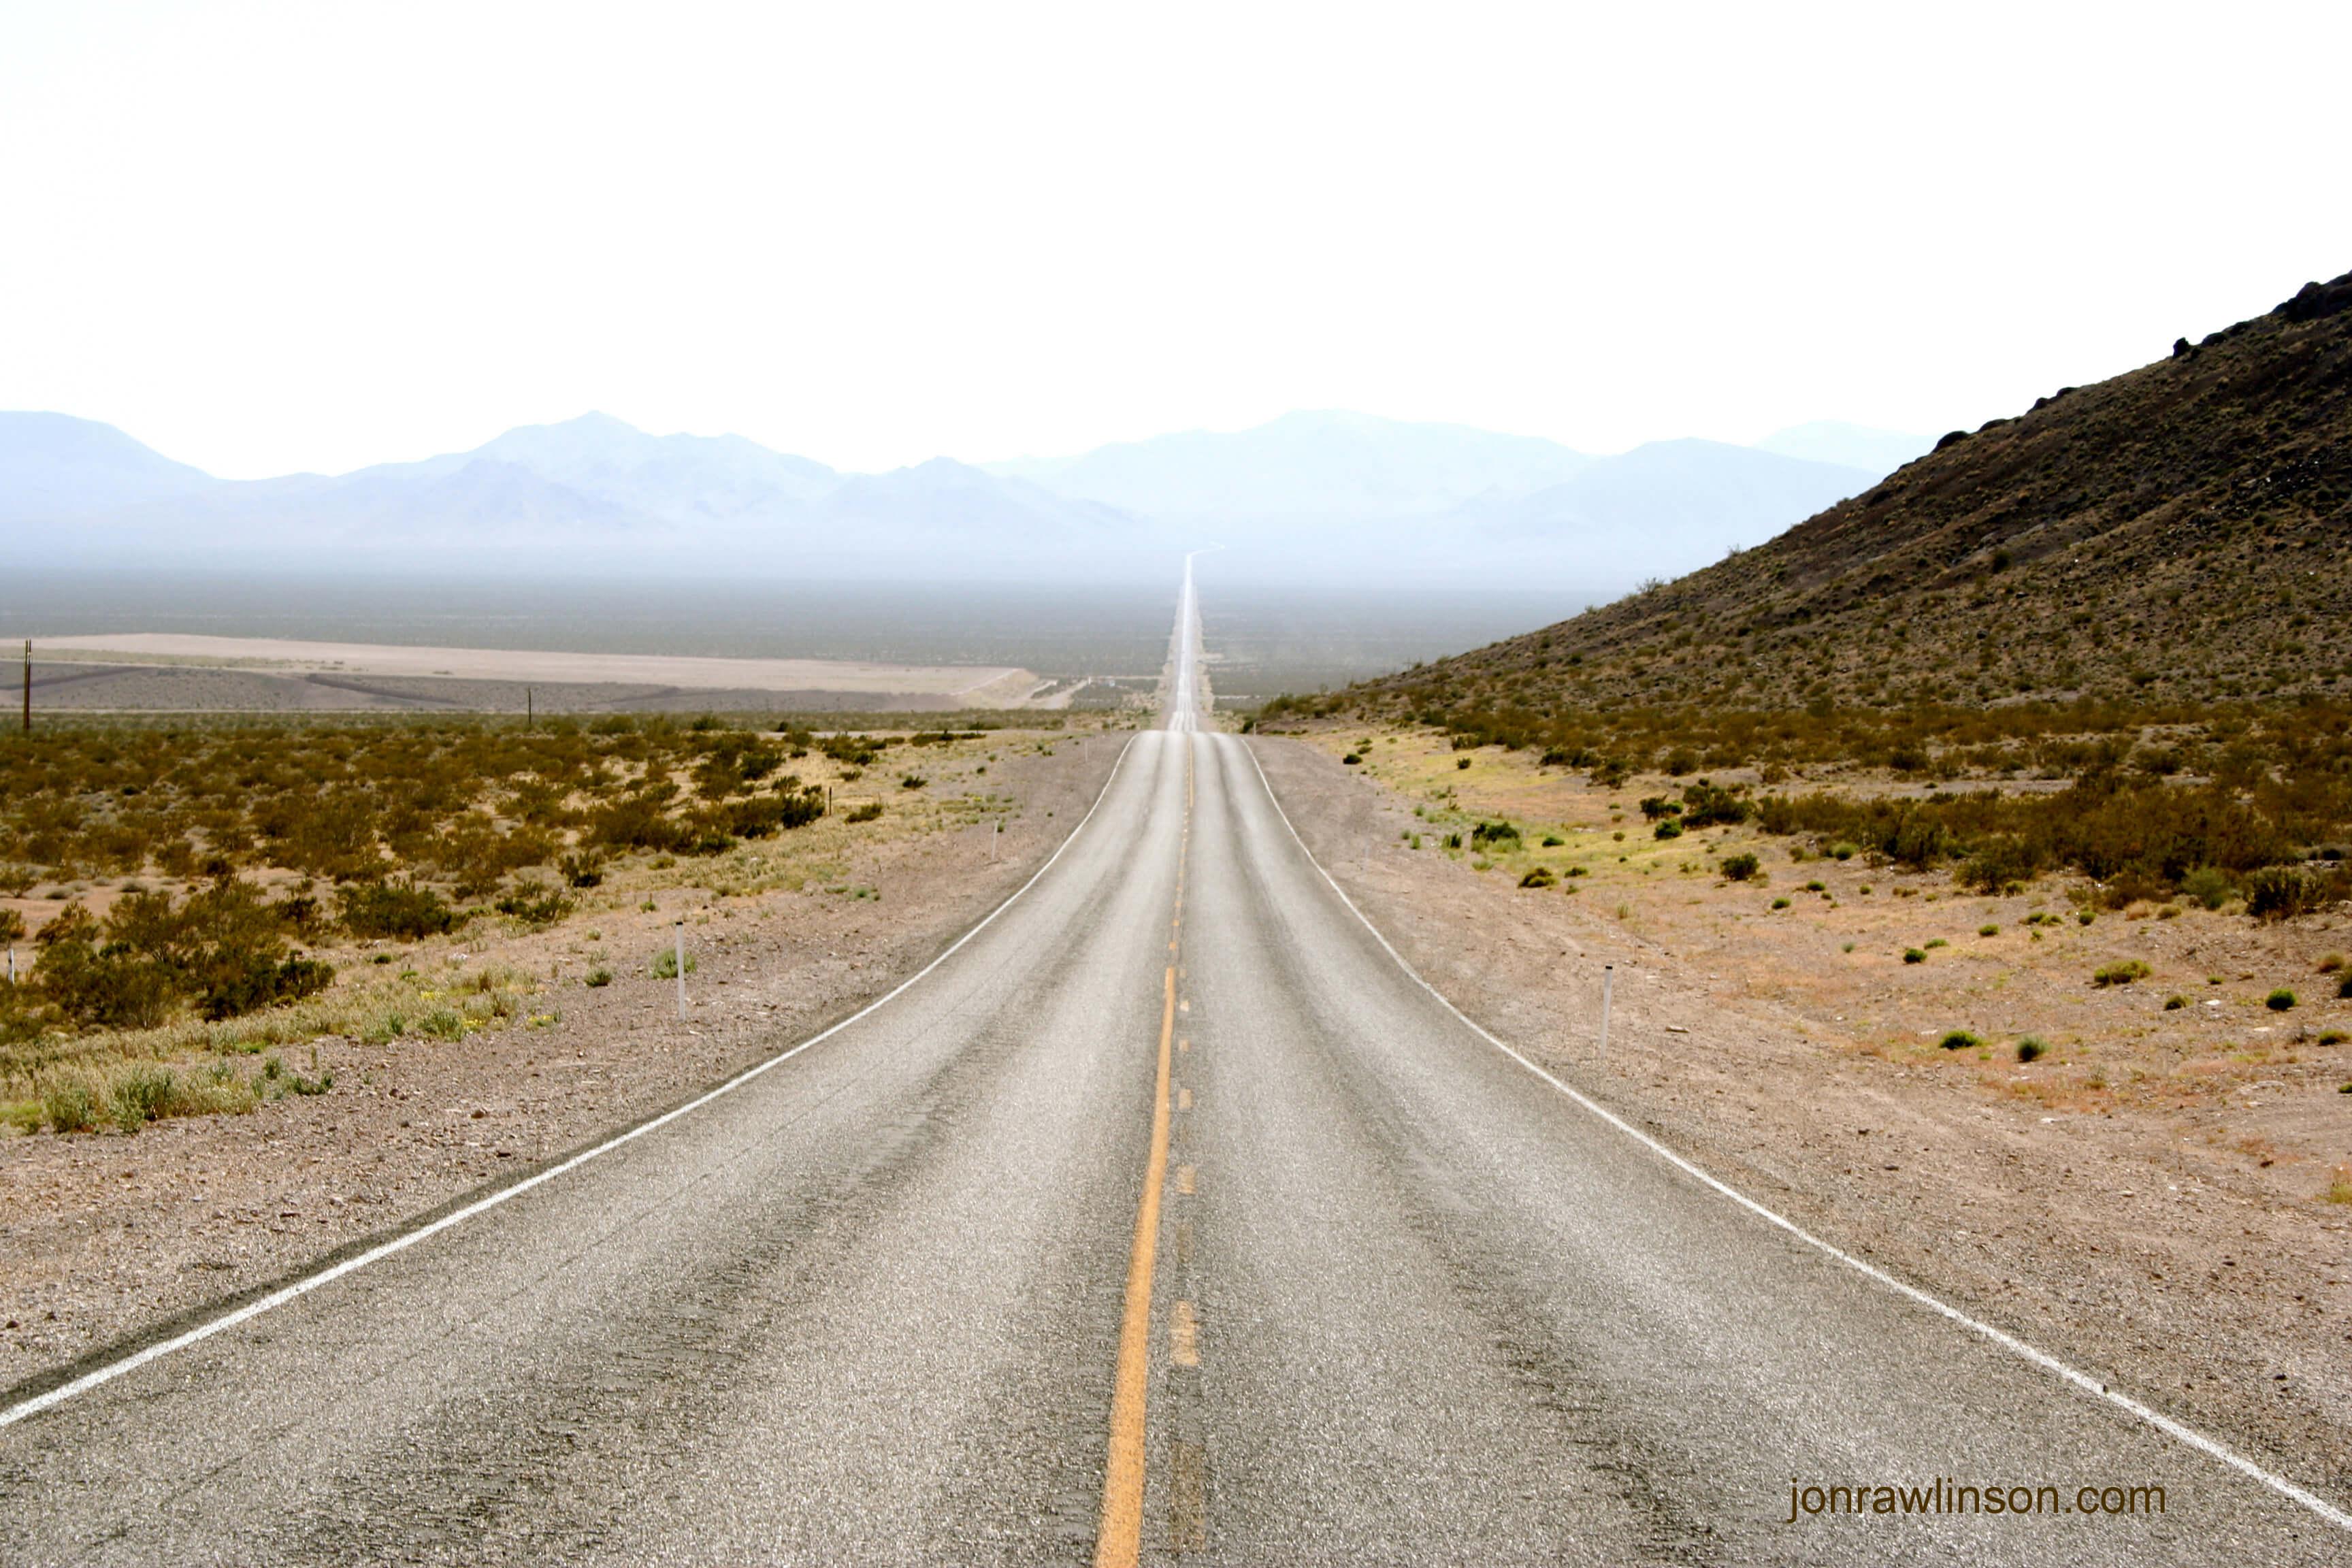 The_Long_Road_Ahead